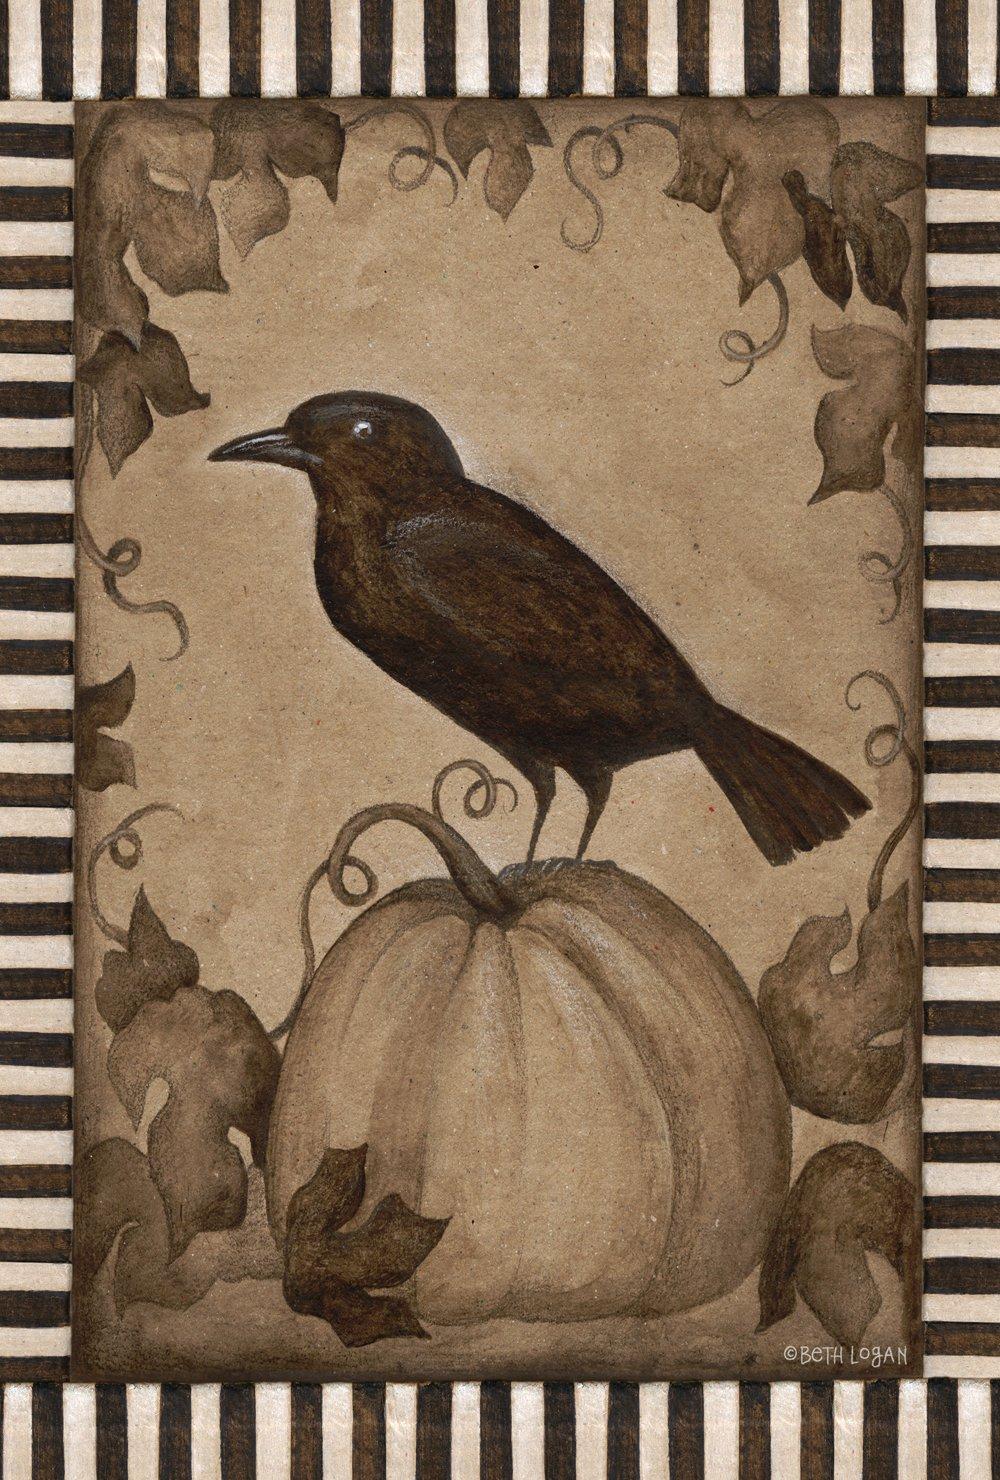 Halloween Crow Decorations Black Bird Theme